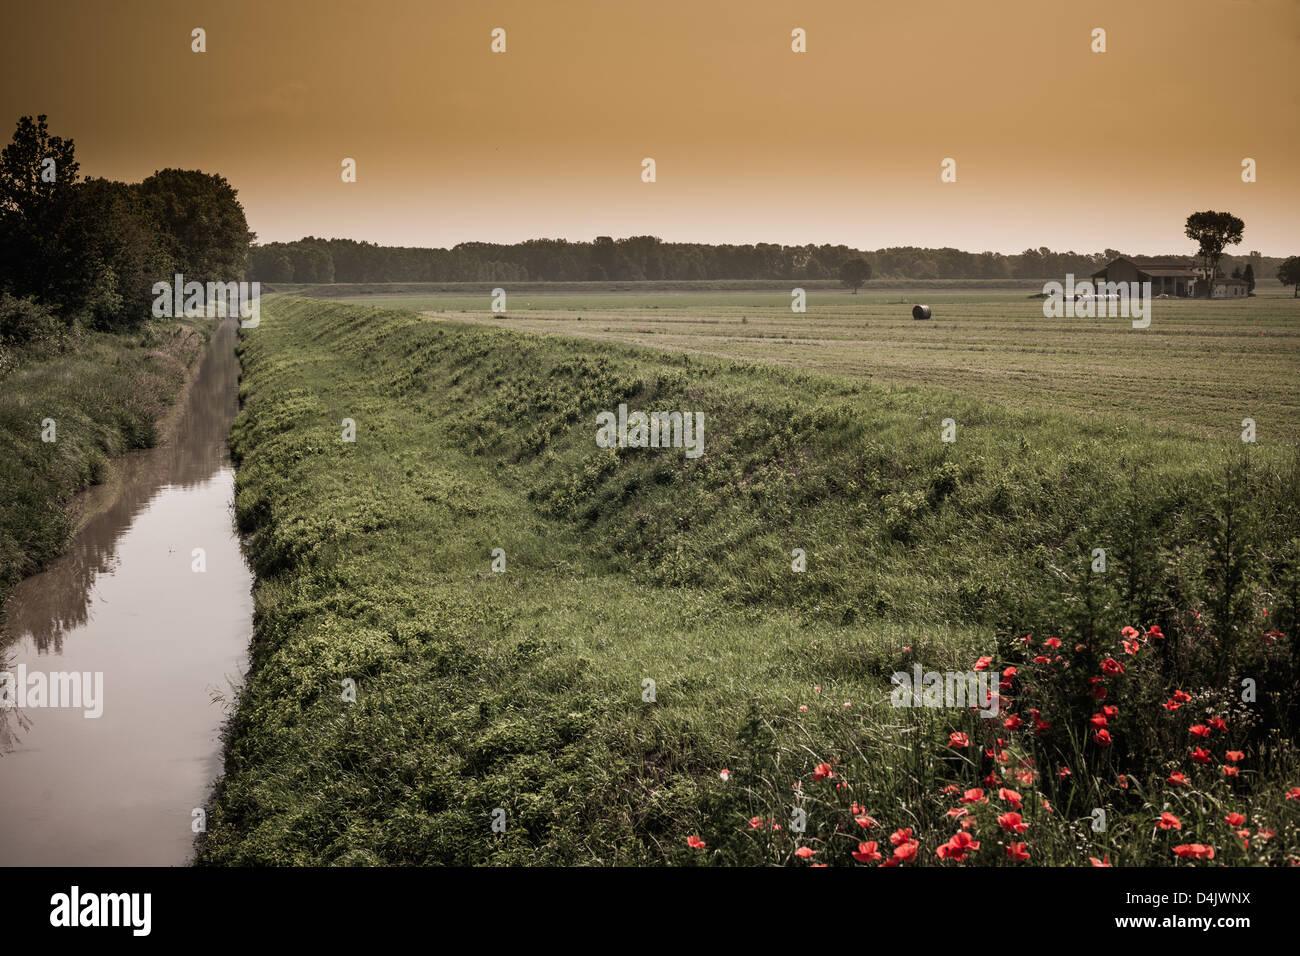 Still creek in rural landscape - Stock Image